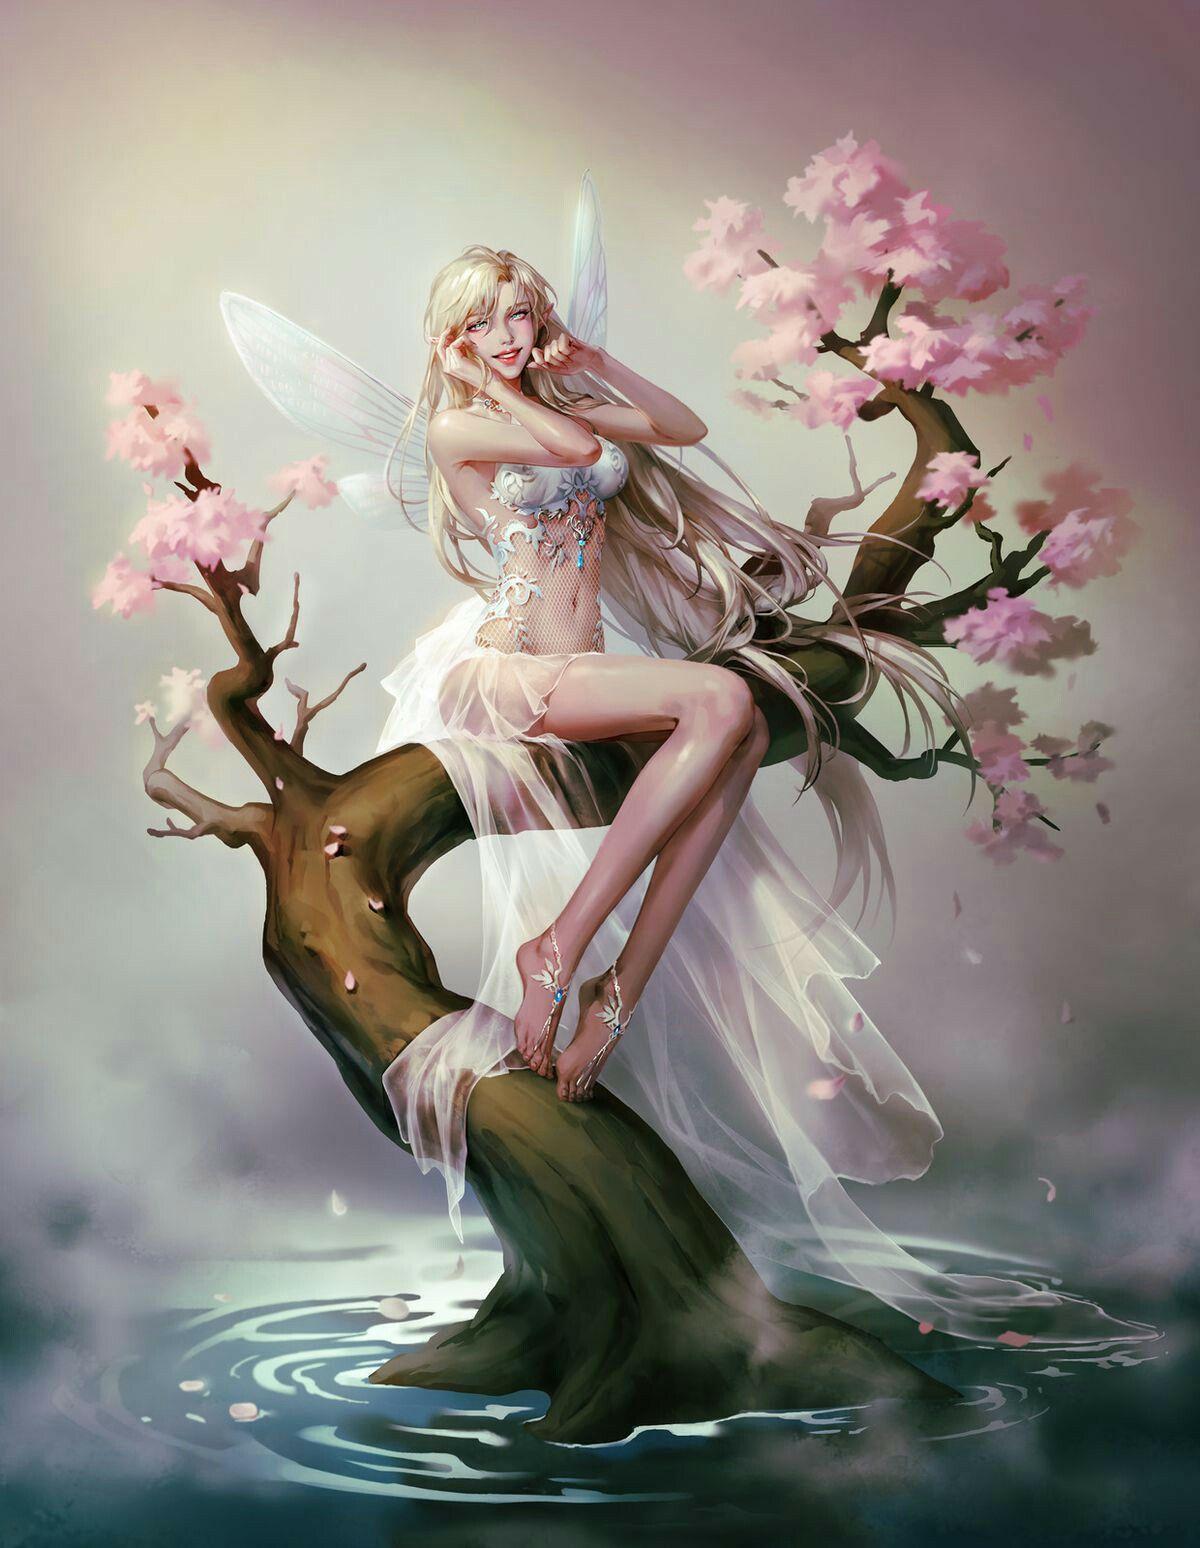 Old Photo Cute Angel Girls - Precious! - The Graphics Fairy